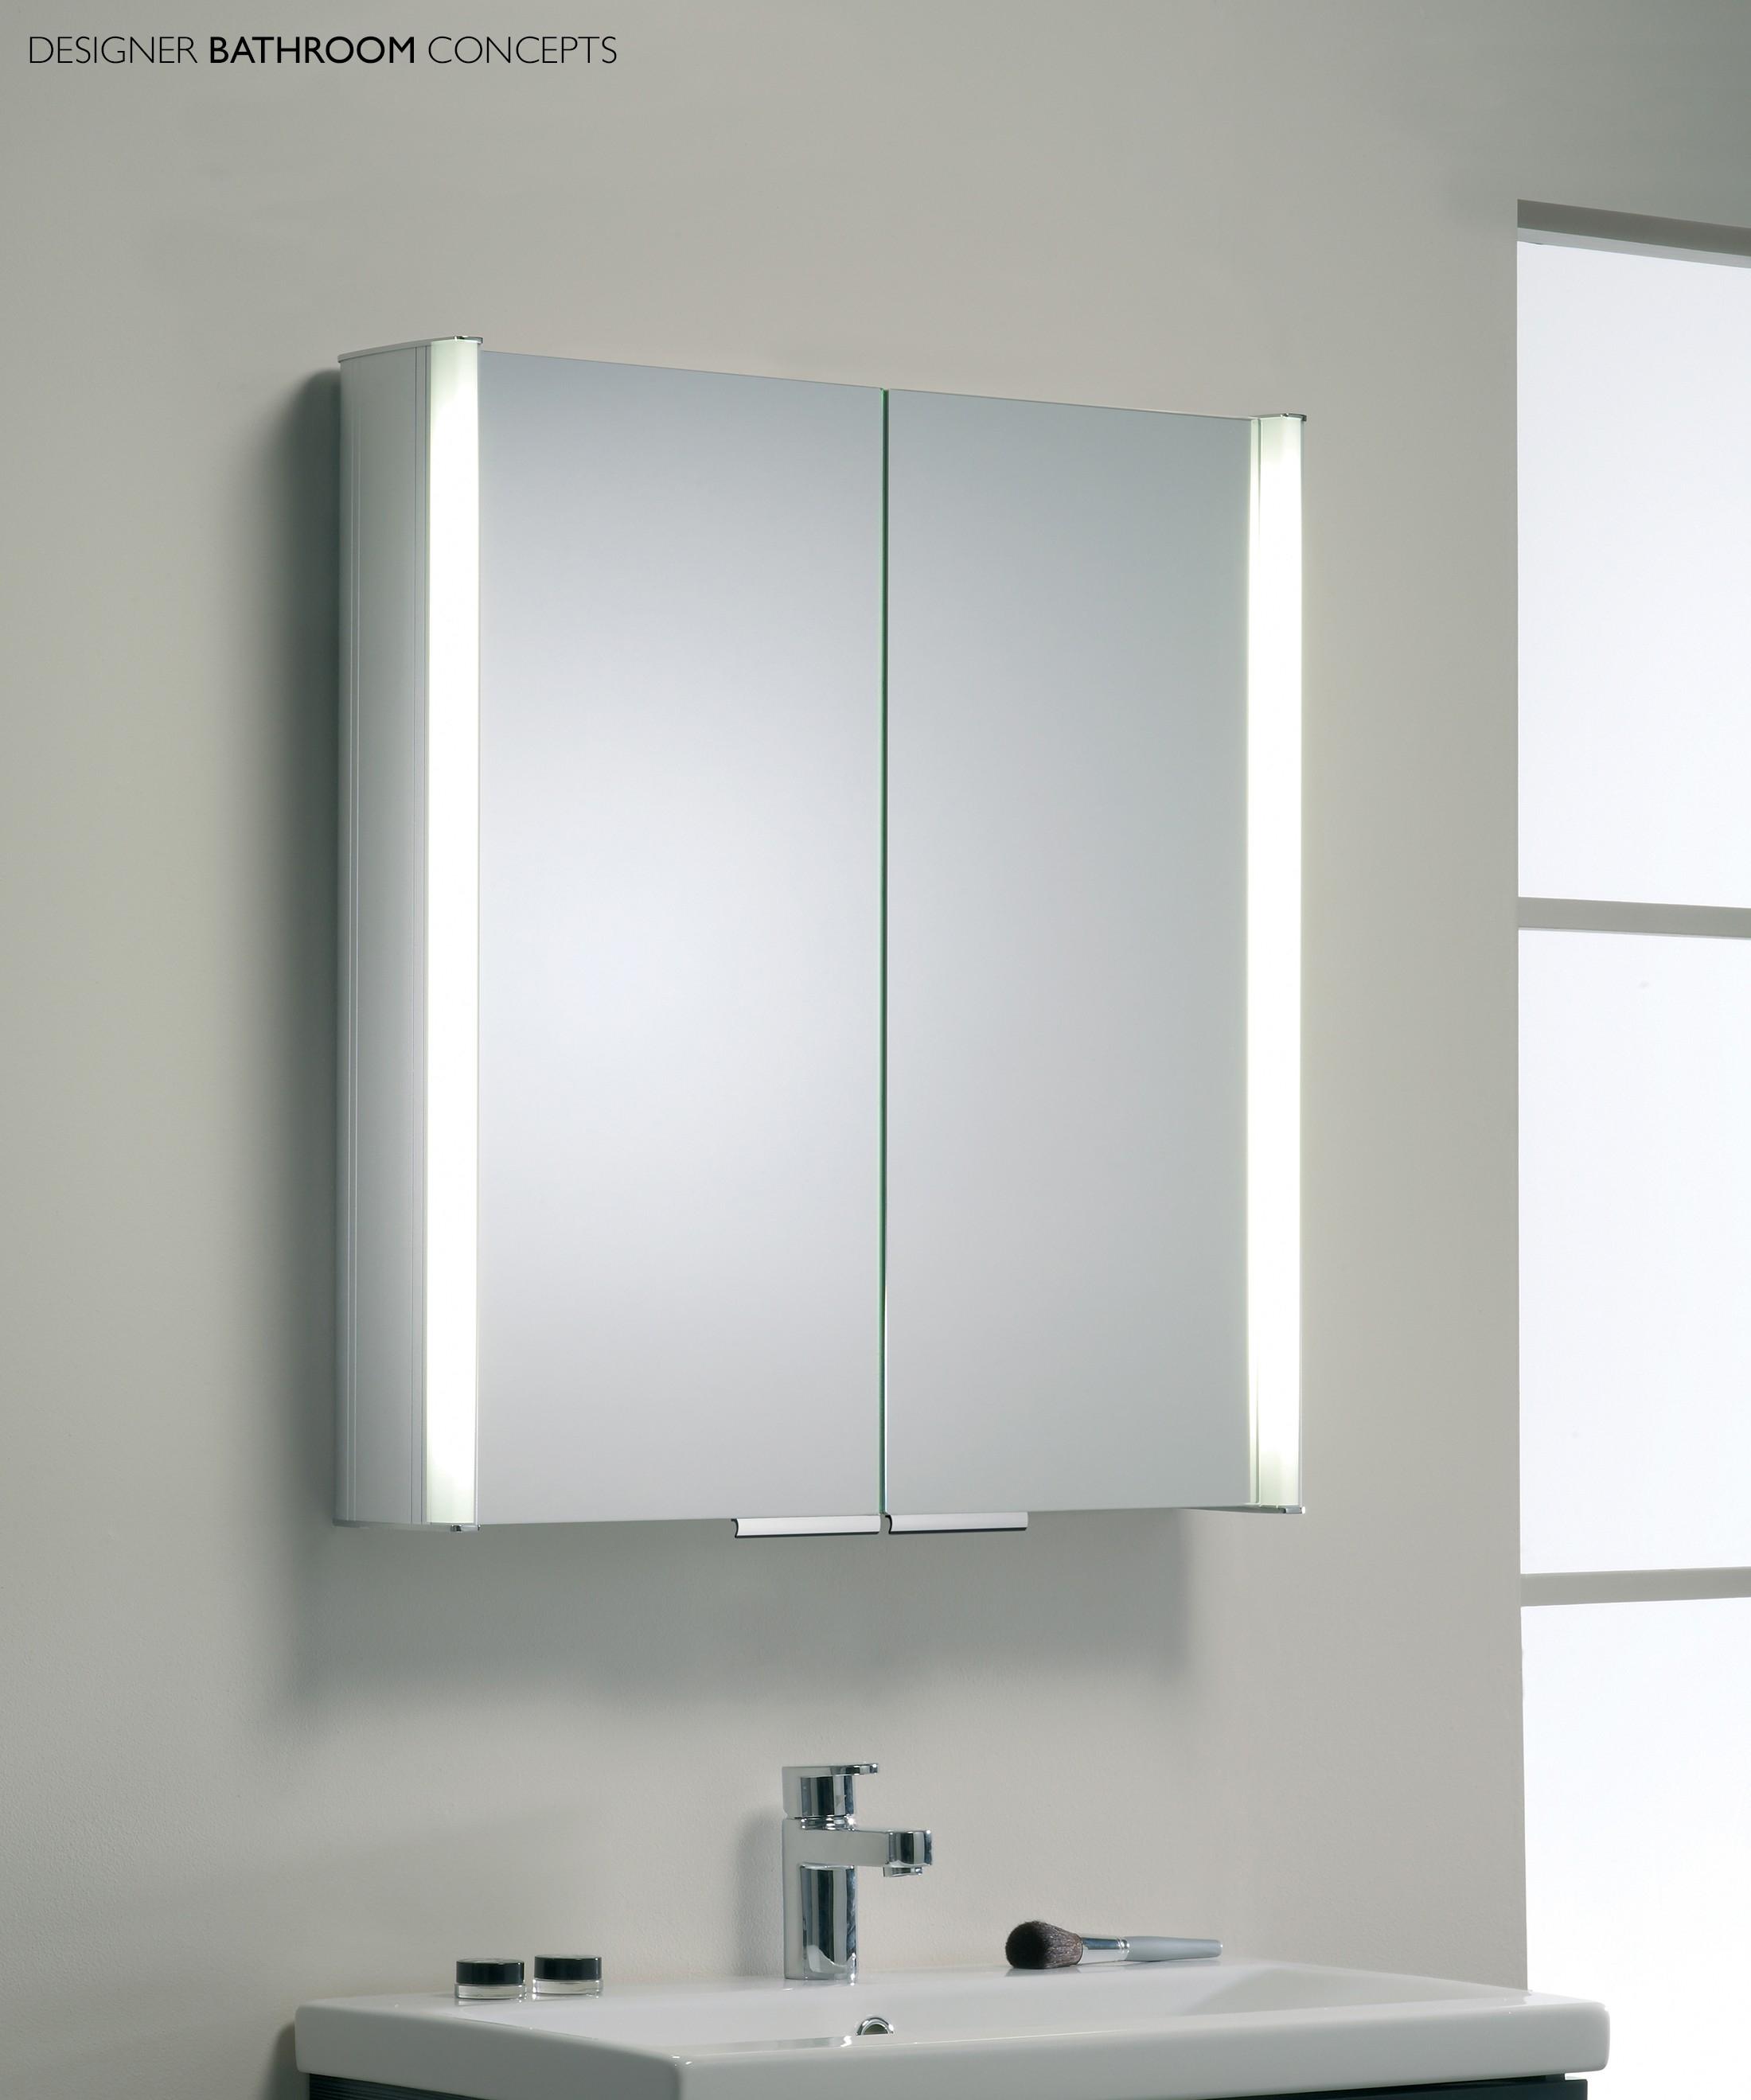 Illuminated Bathroom Mirrors And Cabinets